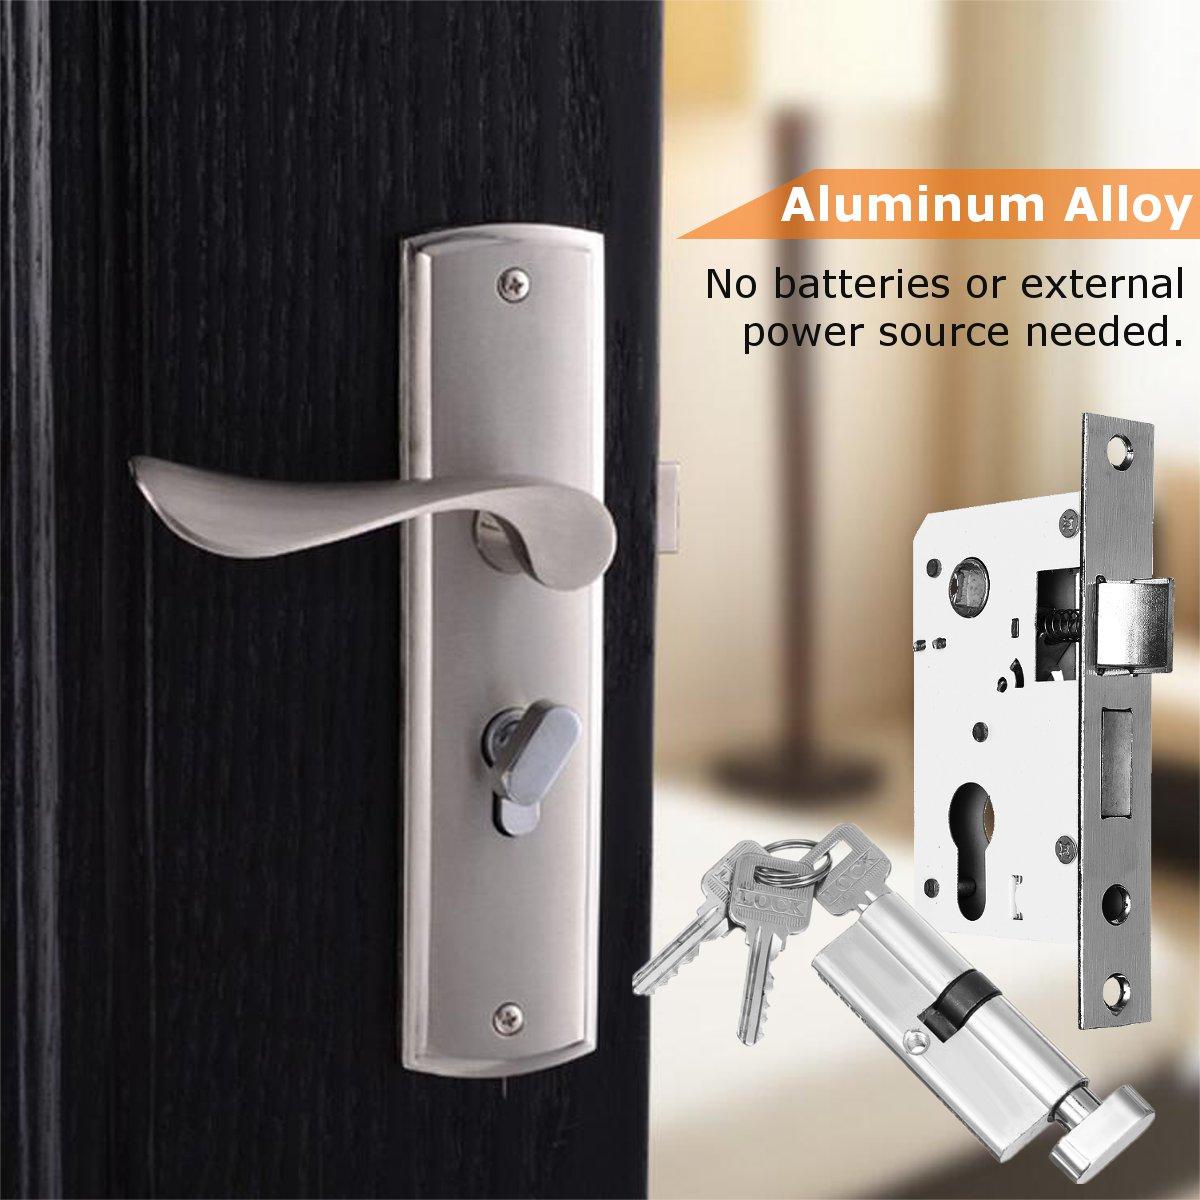 Aluminum Alloy Mechanical Door Lock Set Handle Deadbolt Latch Locks Interior Lockset Kit Home Office Security Door Hardware